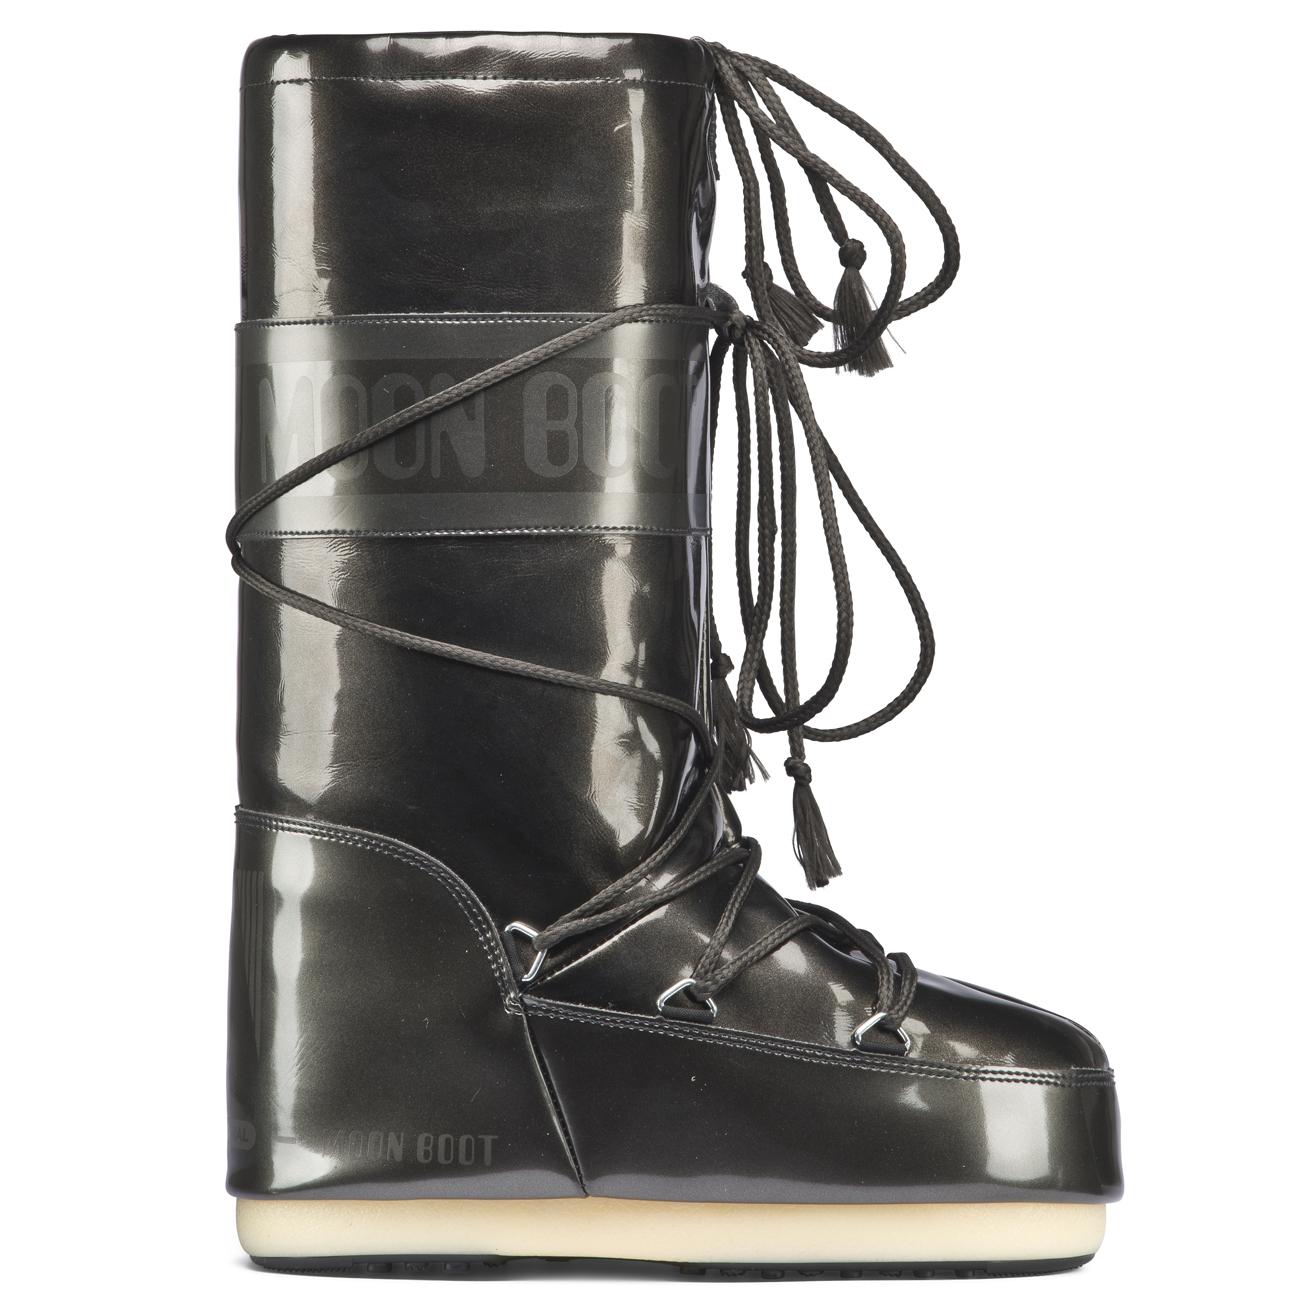 Unisex Adults Original Tecnica Moon Boot Vinil Met Nylon Nylon Nylon Padded Boots All Sizes 0313b1